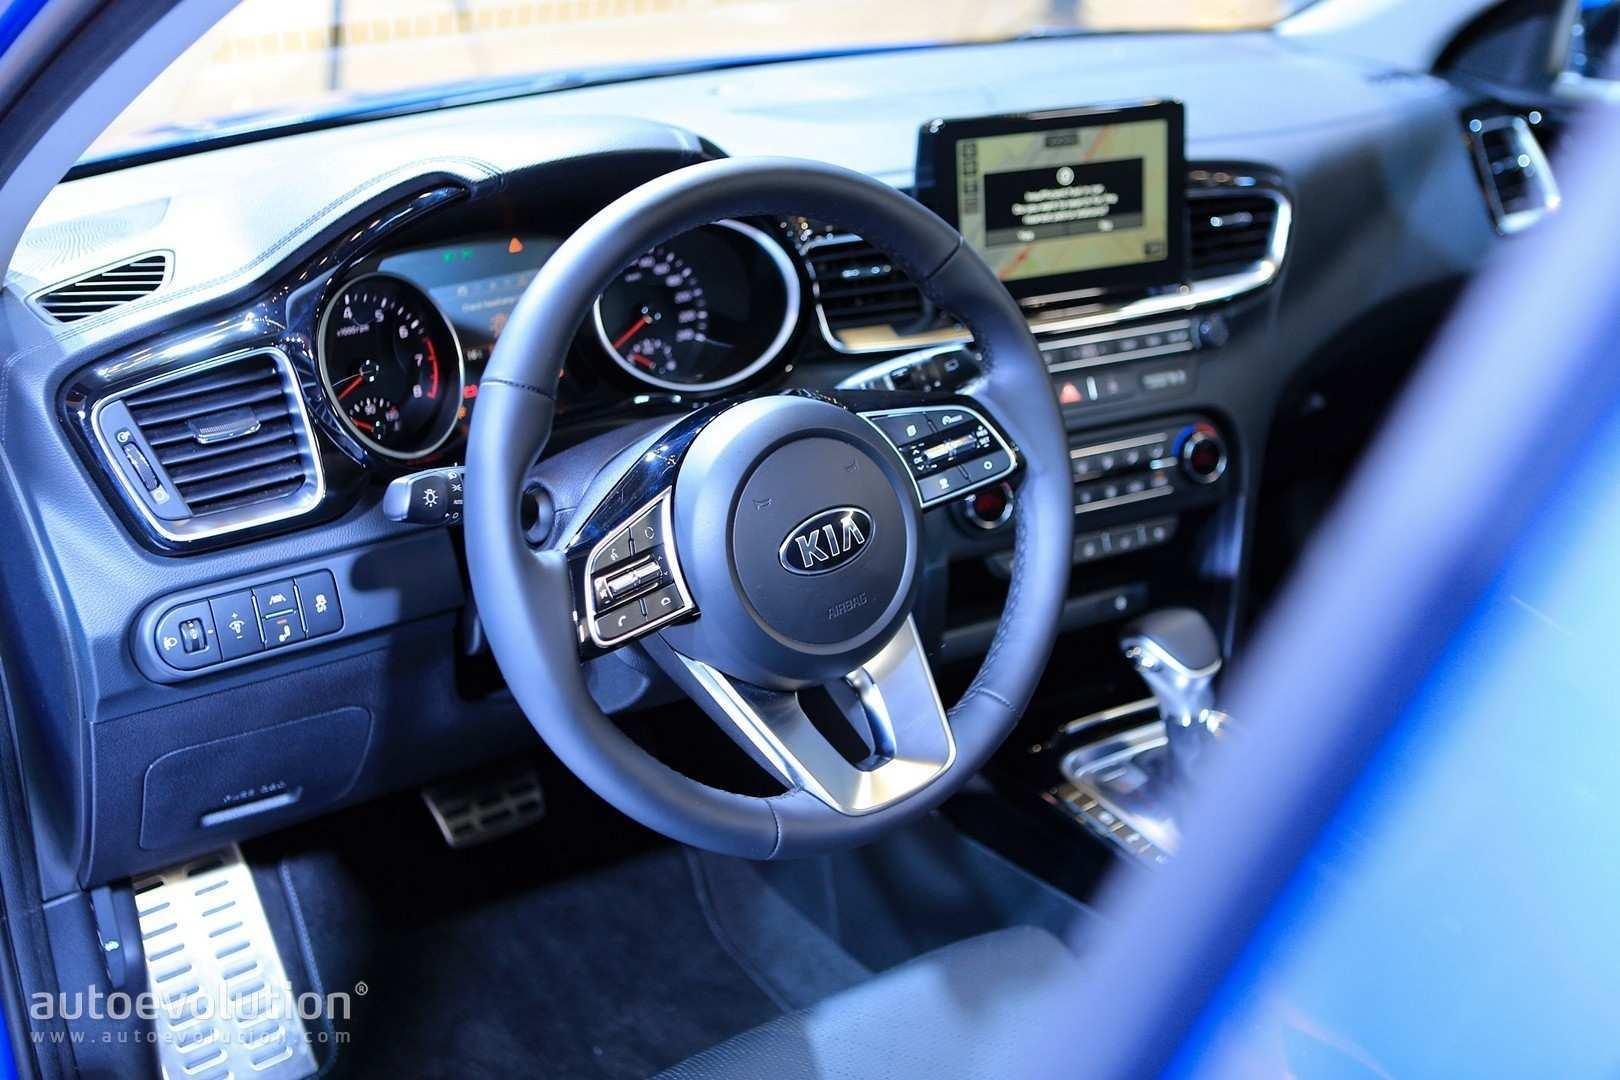 87 New Kia Wagon 2019 Price Redesign and Concept by Kia Wagon 2019 Price